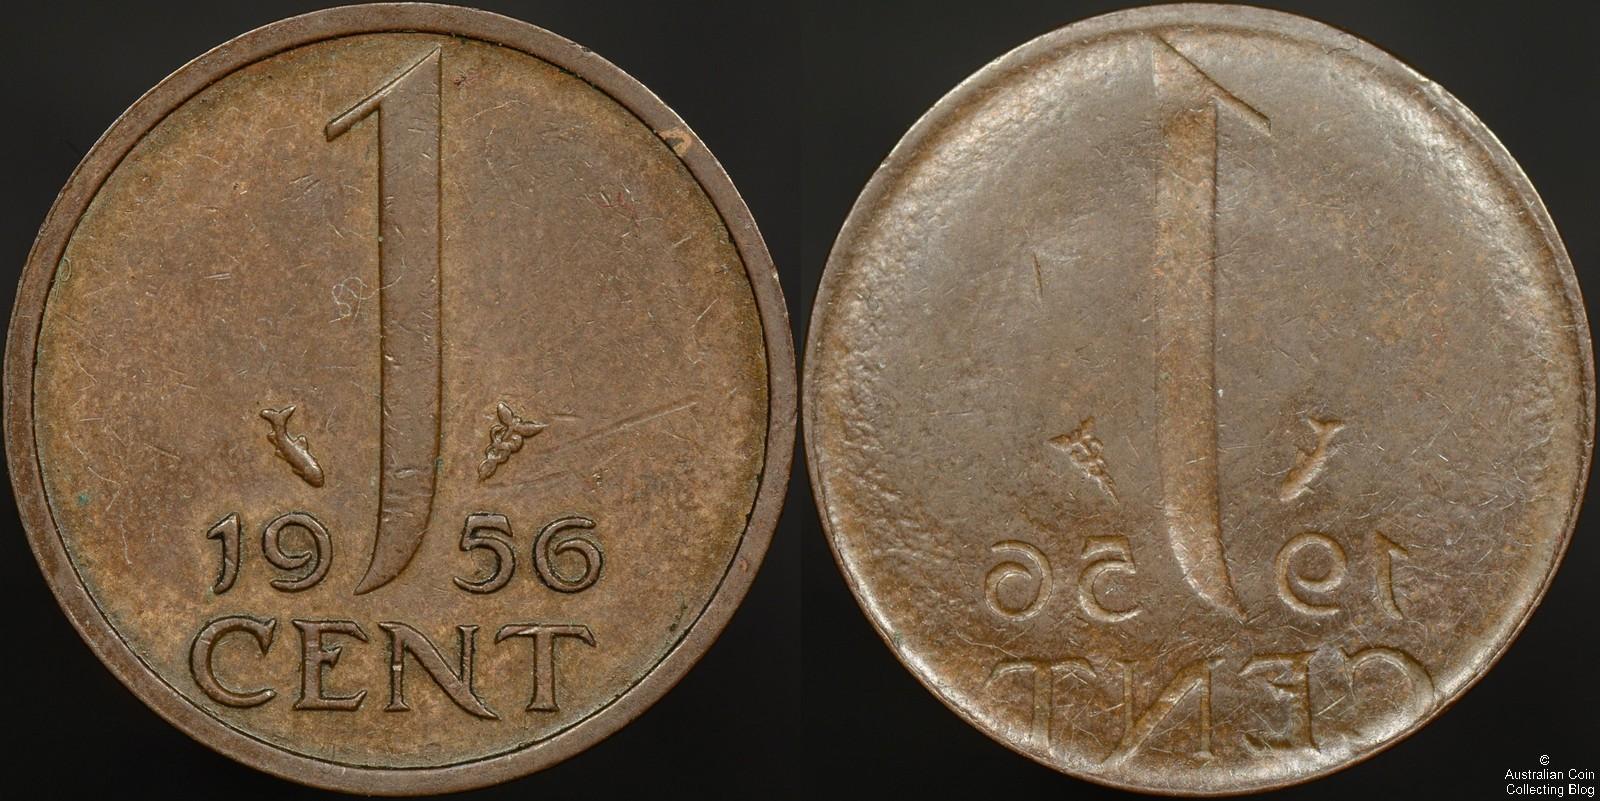 Netherlands 1956 1 Full Reverse Brockage Error